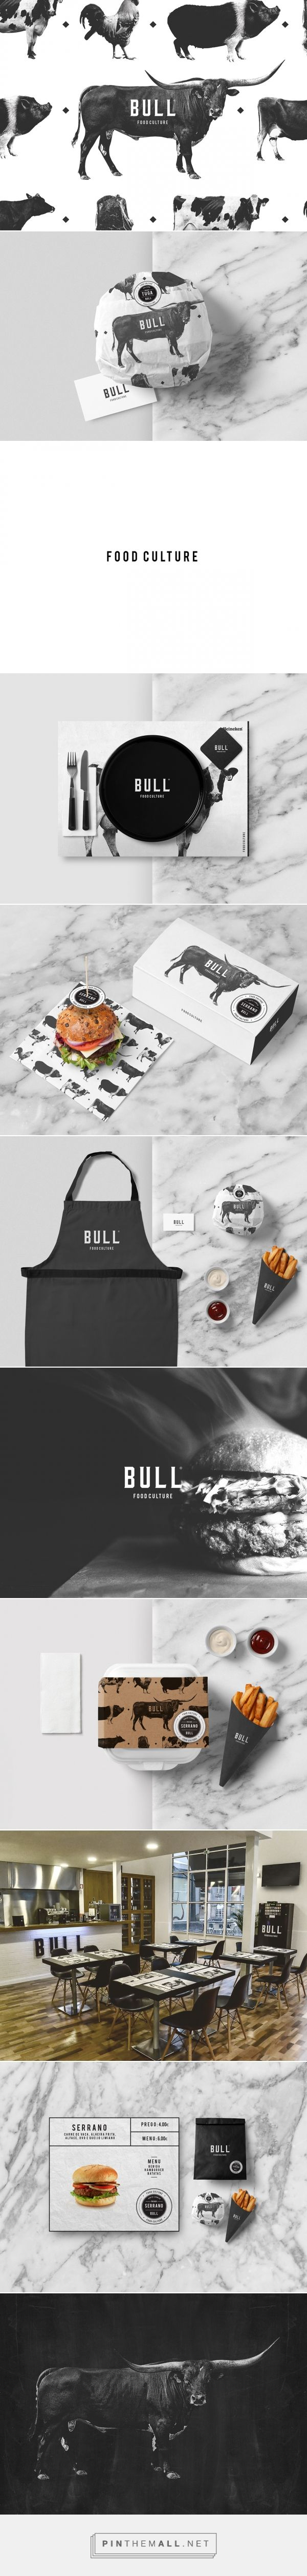 BULL - Food Culture